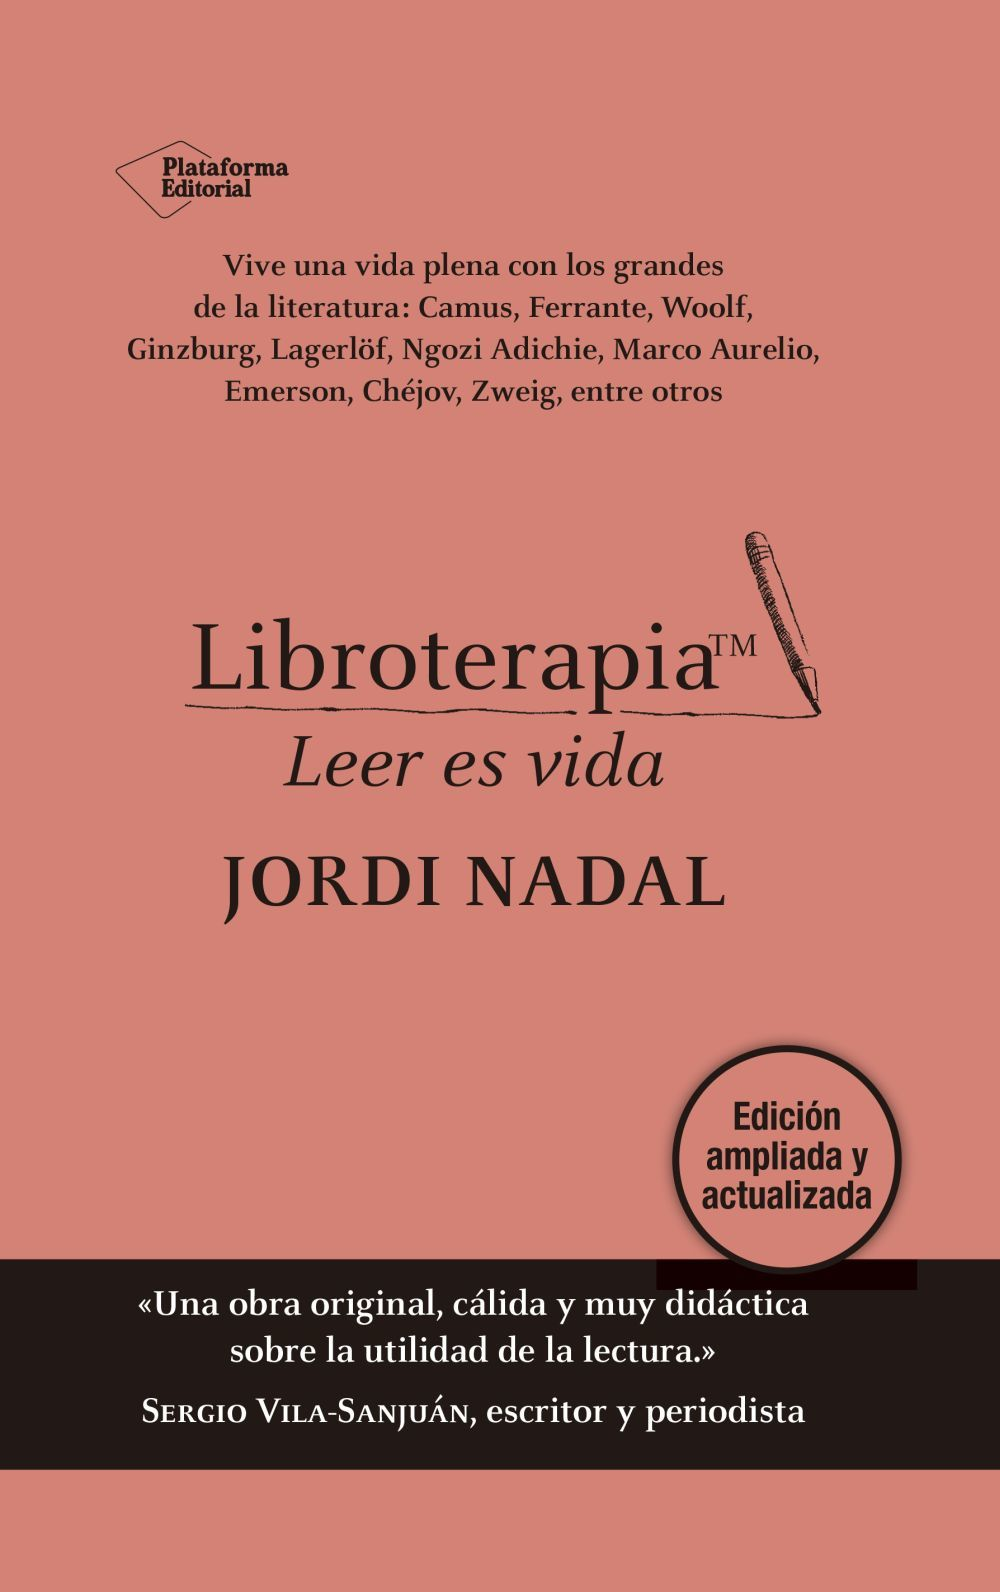 Libroterapia (Plataforma Editorial), de Jordi Nadal.